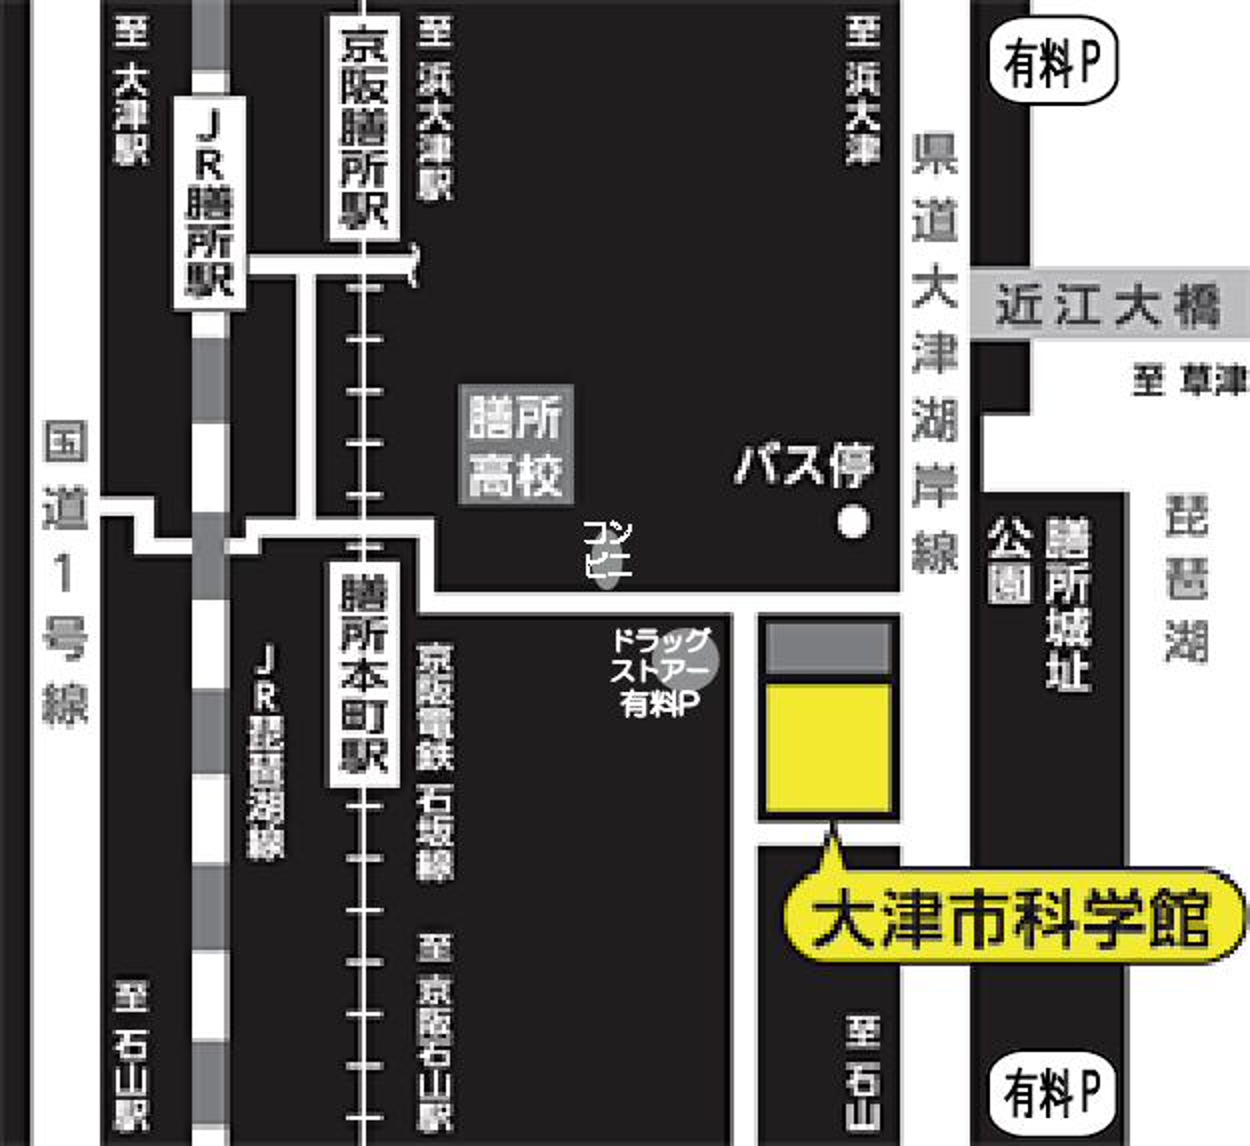 http://www.otsu.ed.jp/kagaku/01_guidance/images/chizu2%E6%96%B0.png